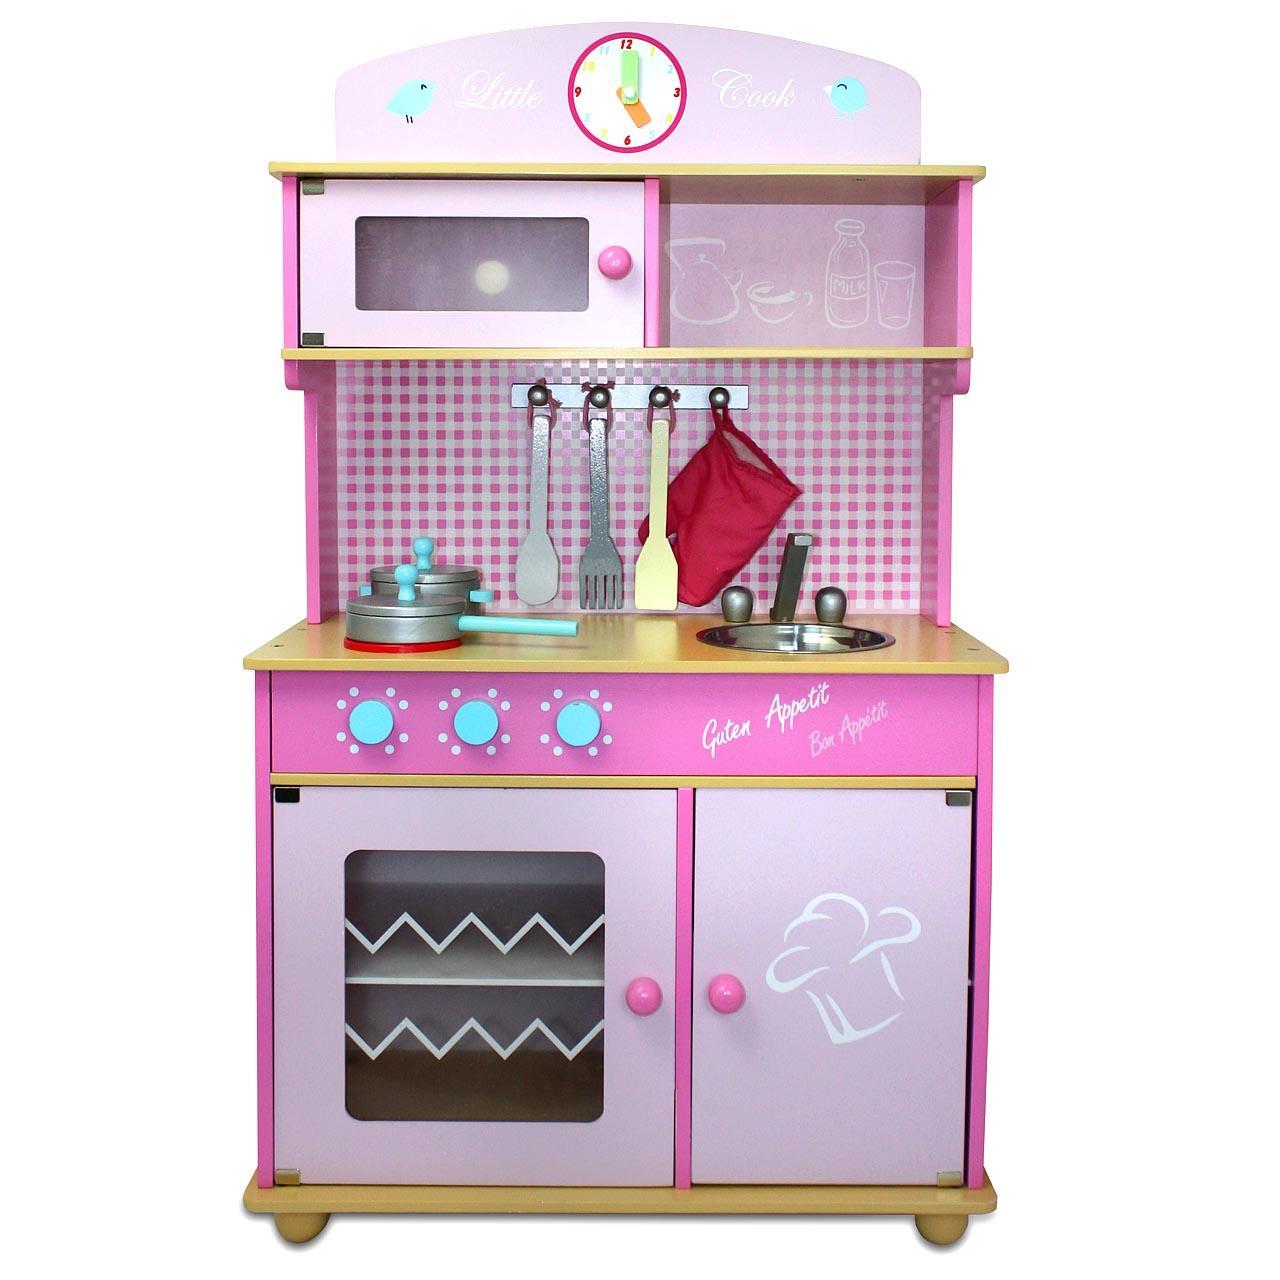 kinderk che holz spielk che kinderspielk che spielzeugk che holzk che k che ebay. Black Bedroom Furniture Sets. Home Design Ideas